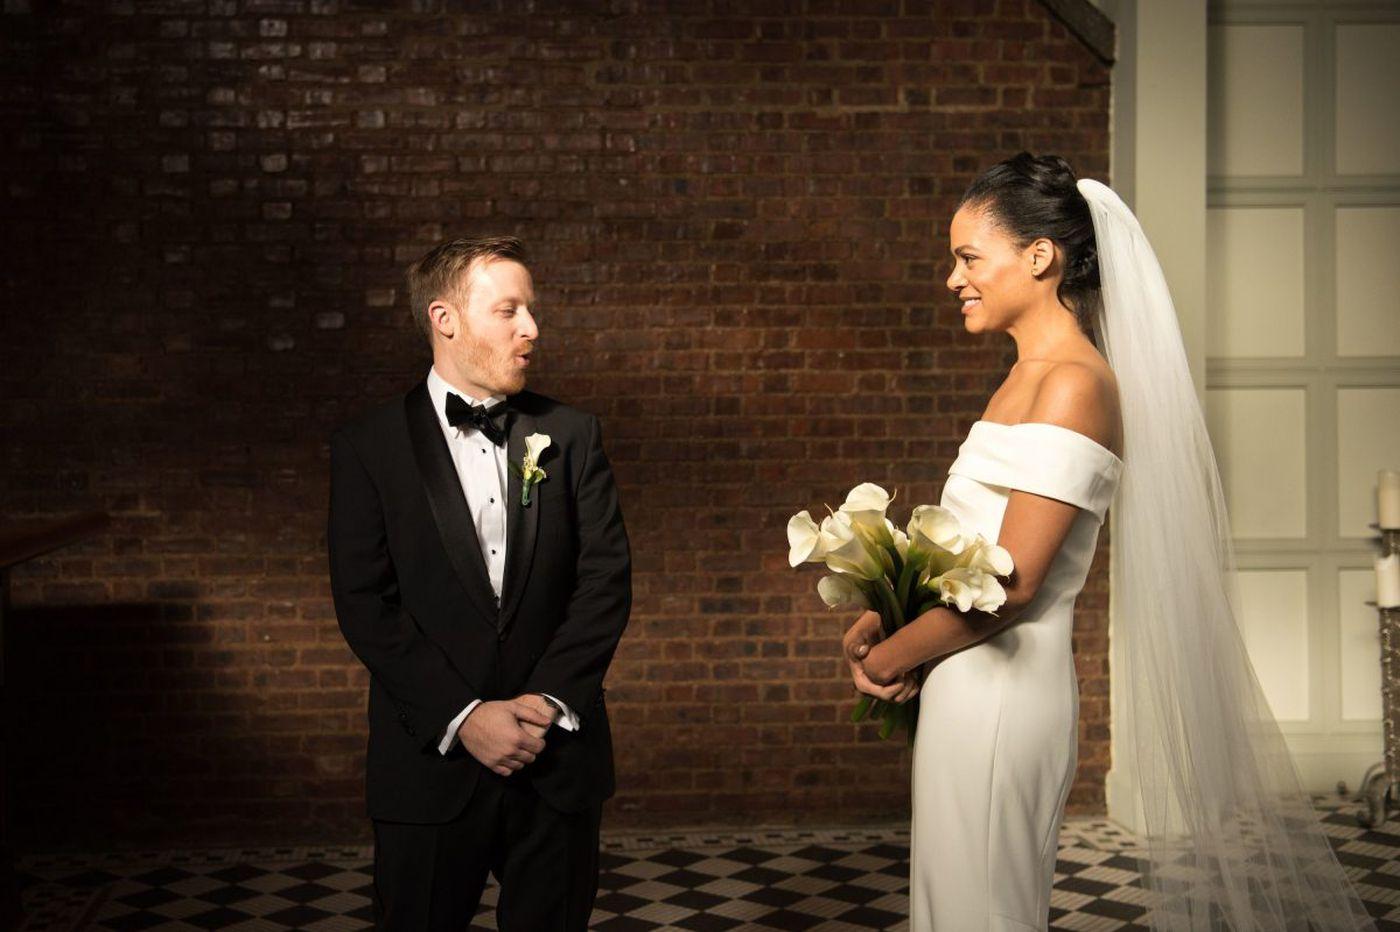 Philadelphia weddings: Maya Lillienne Mitchell and Frederick Willard Kunda